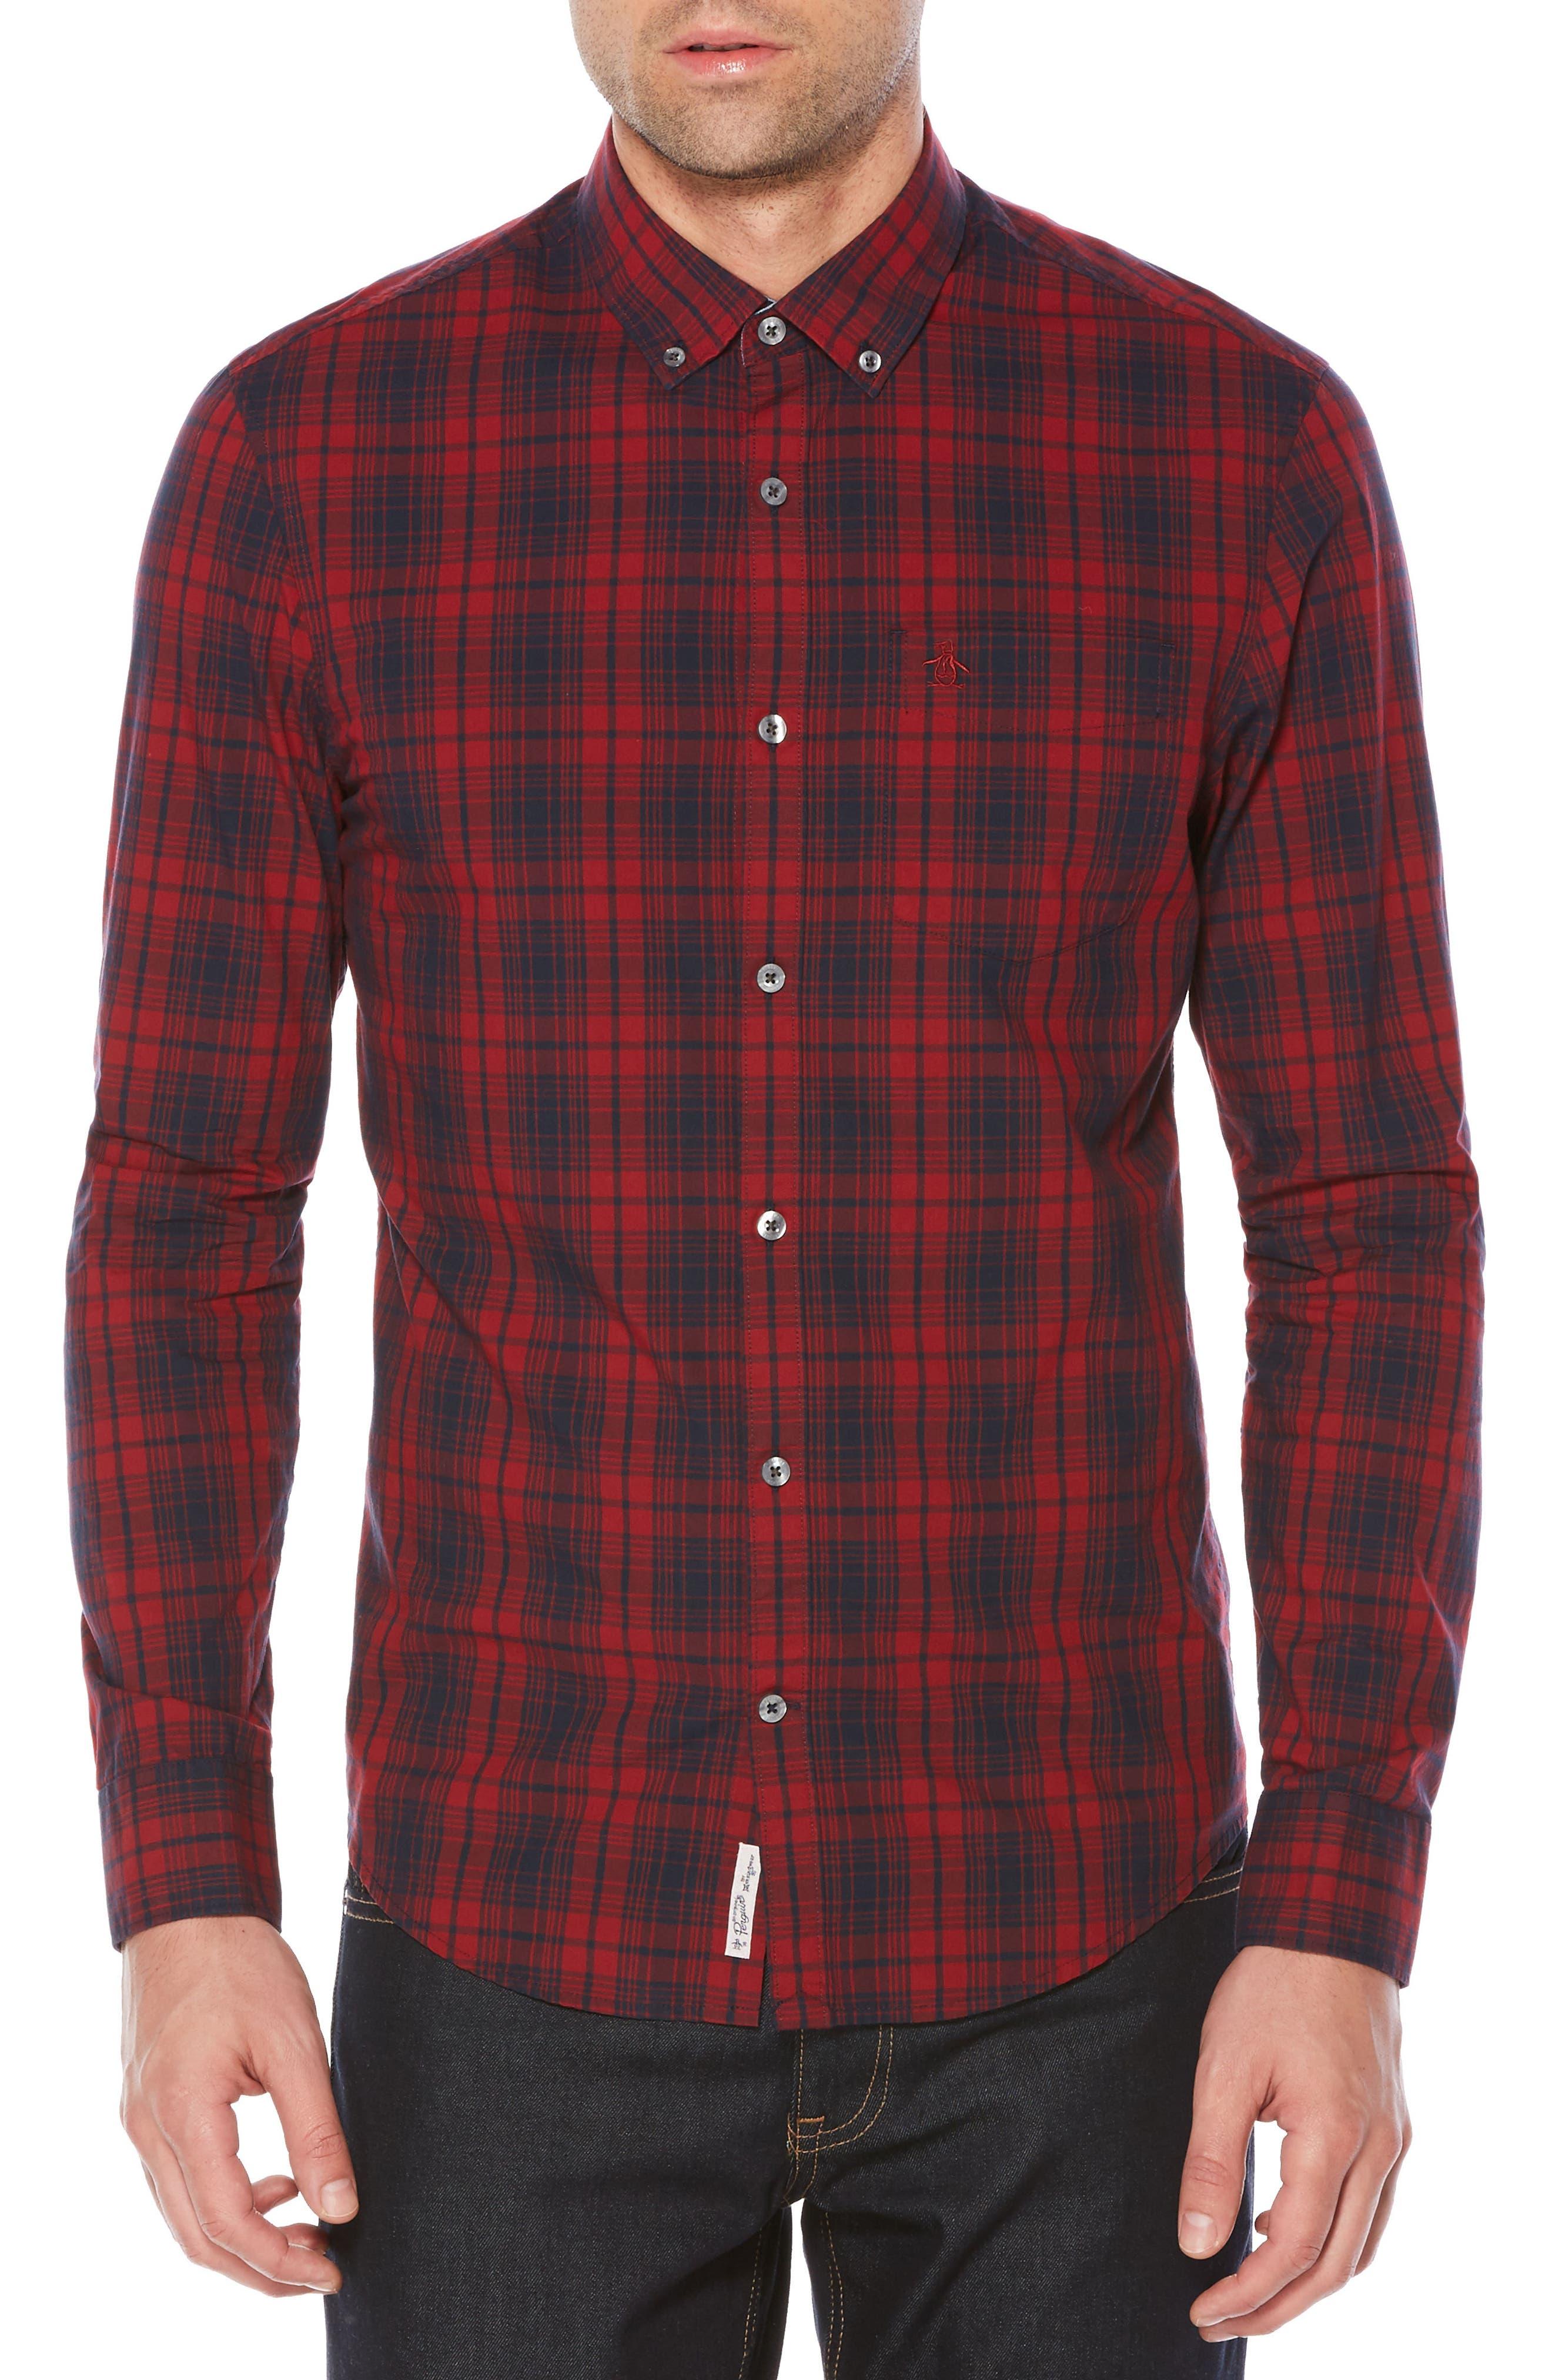 Alternate Image 1 Selected - Original Penguin Heritage Slim Fit Plaid Shirt